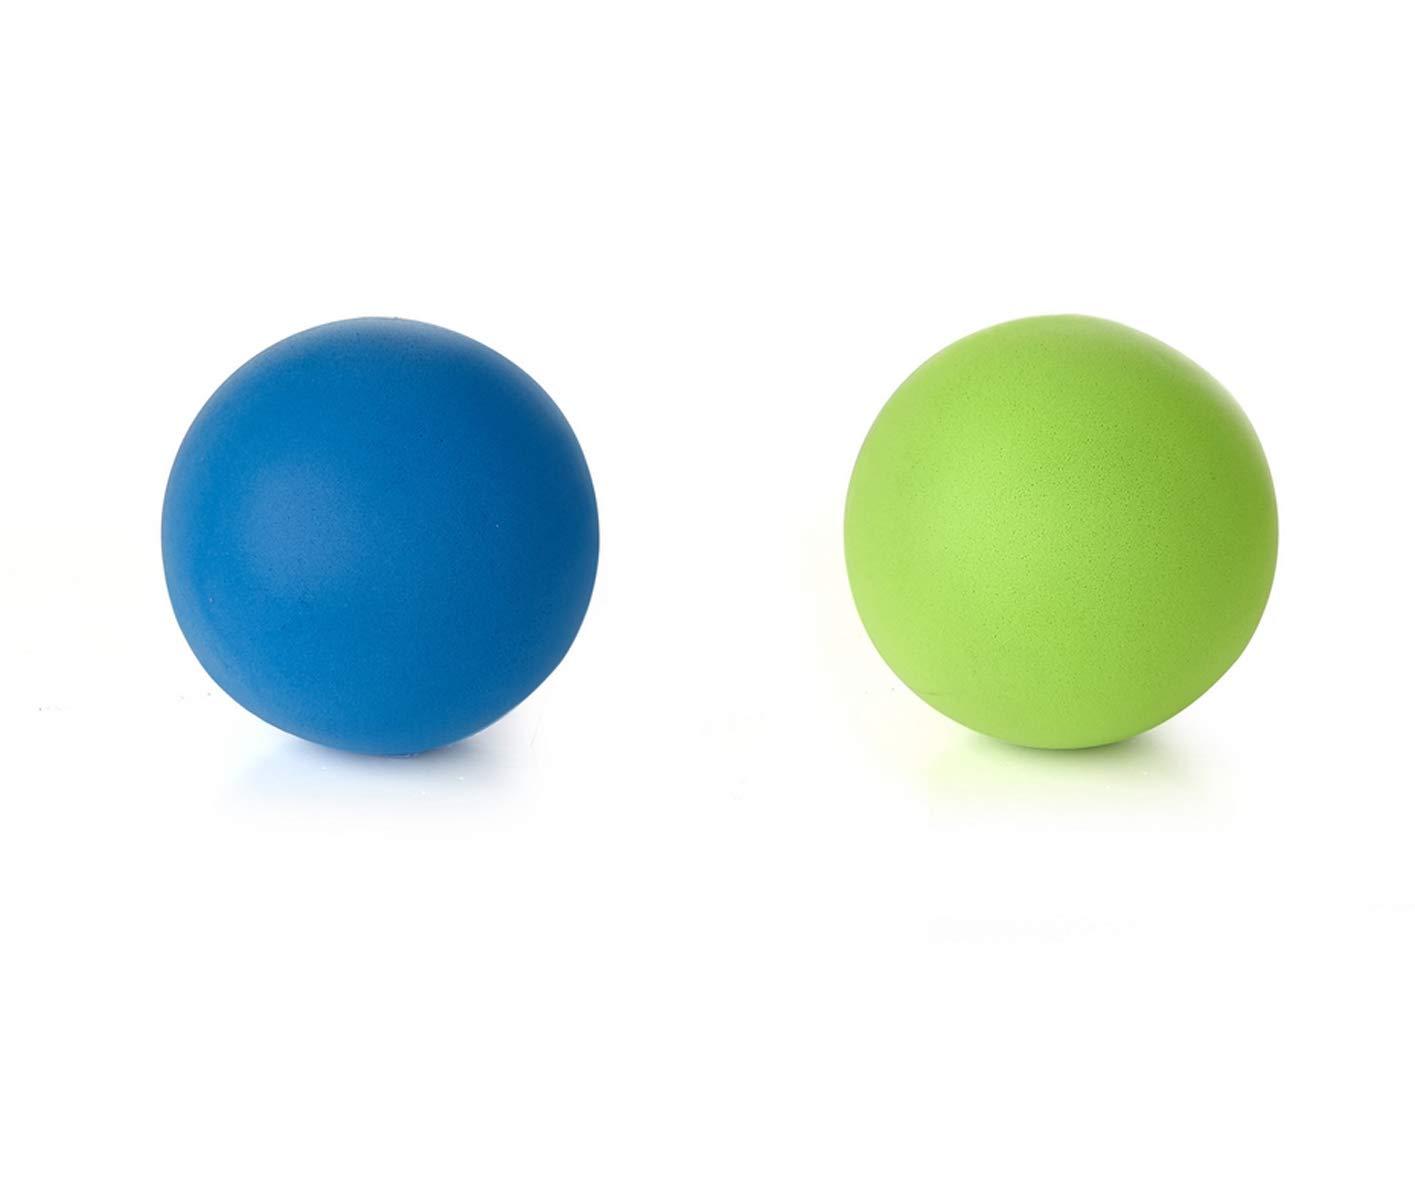 Visiodirect Ballon Handball Mousse 'Hand, Coloris : Assortis - Diamètre 12cm